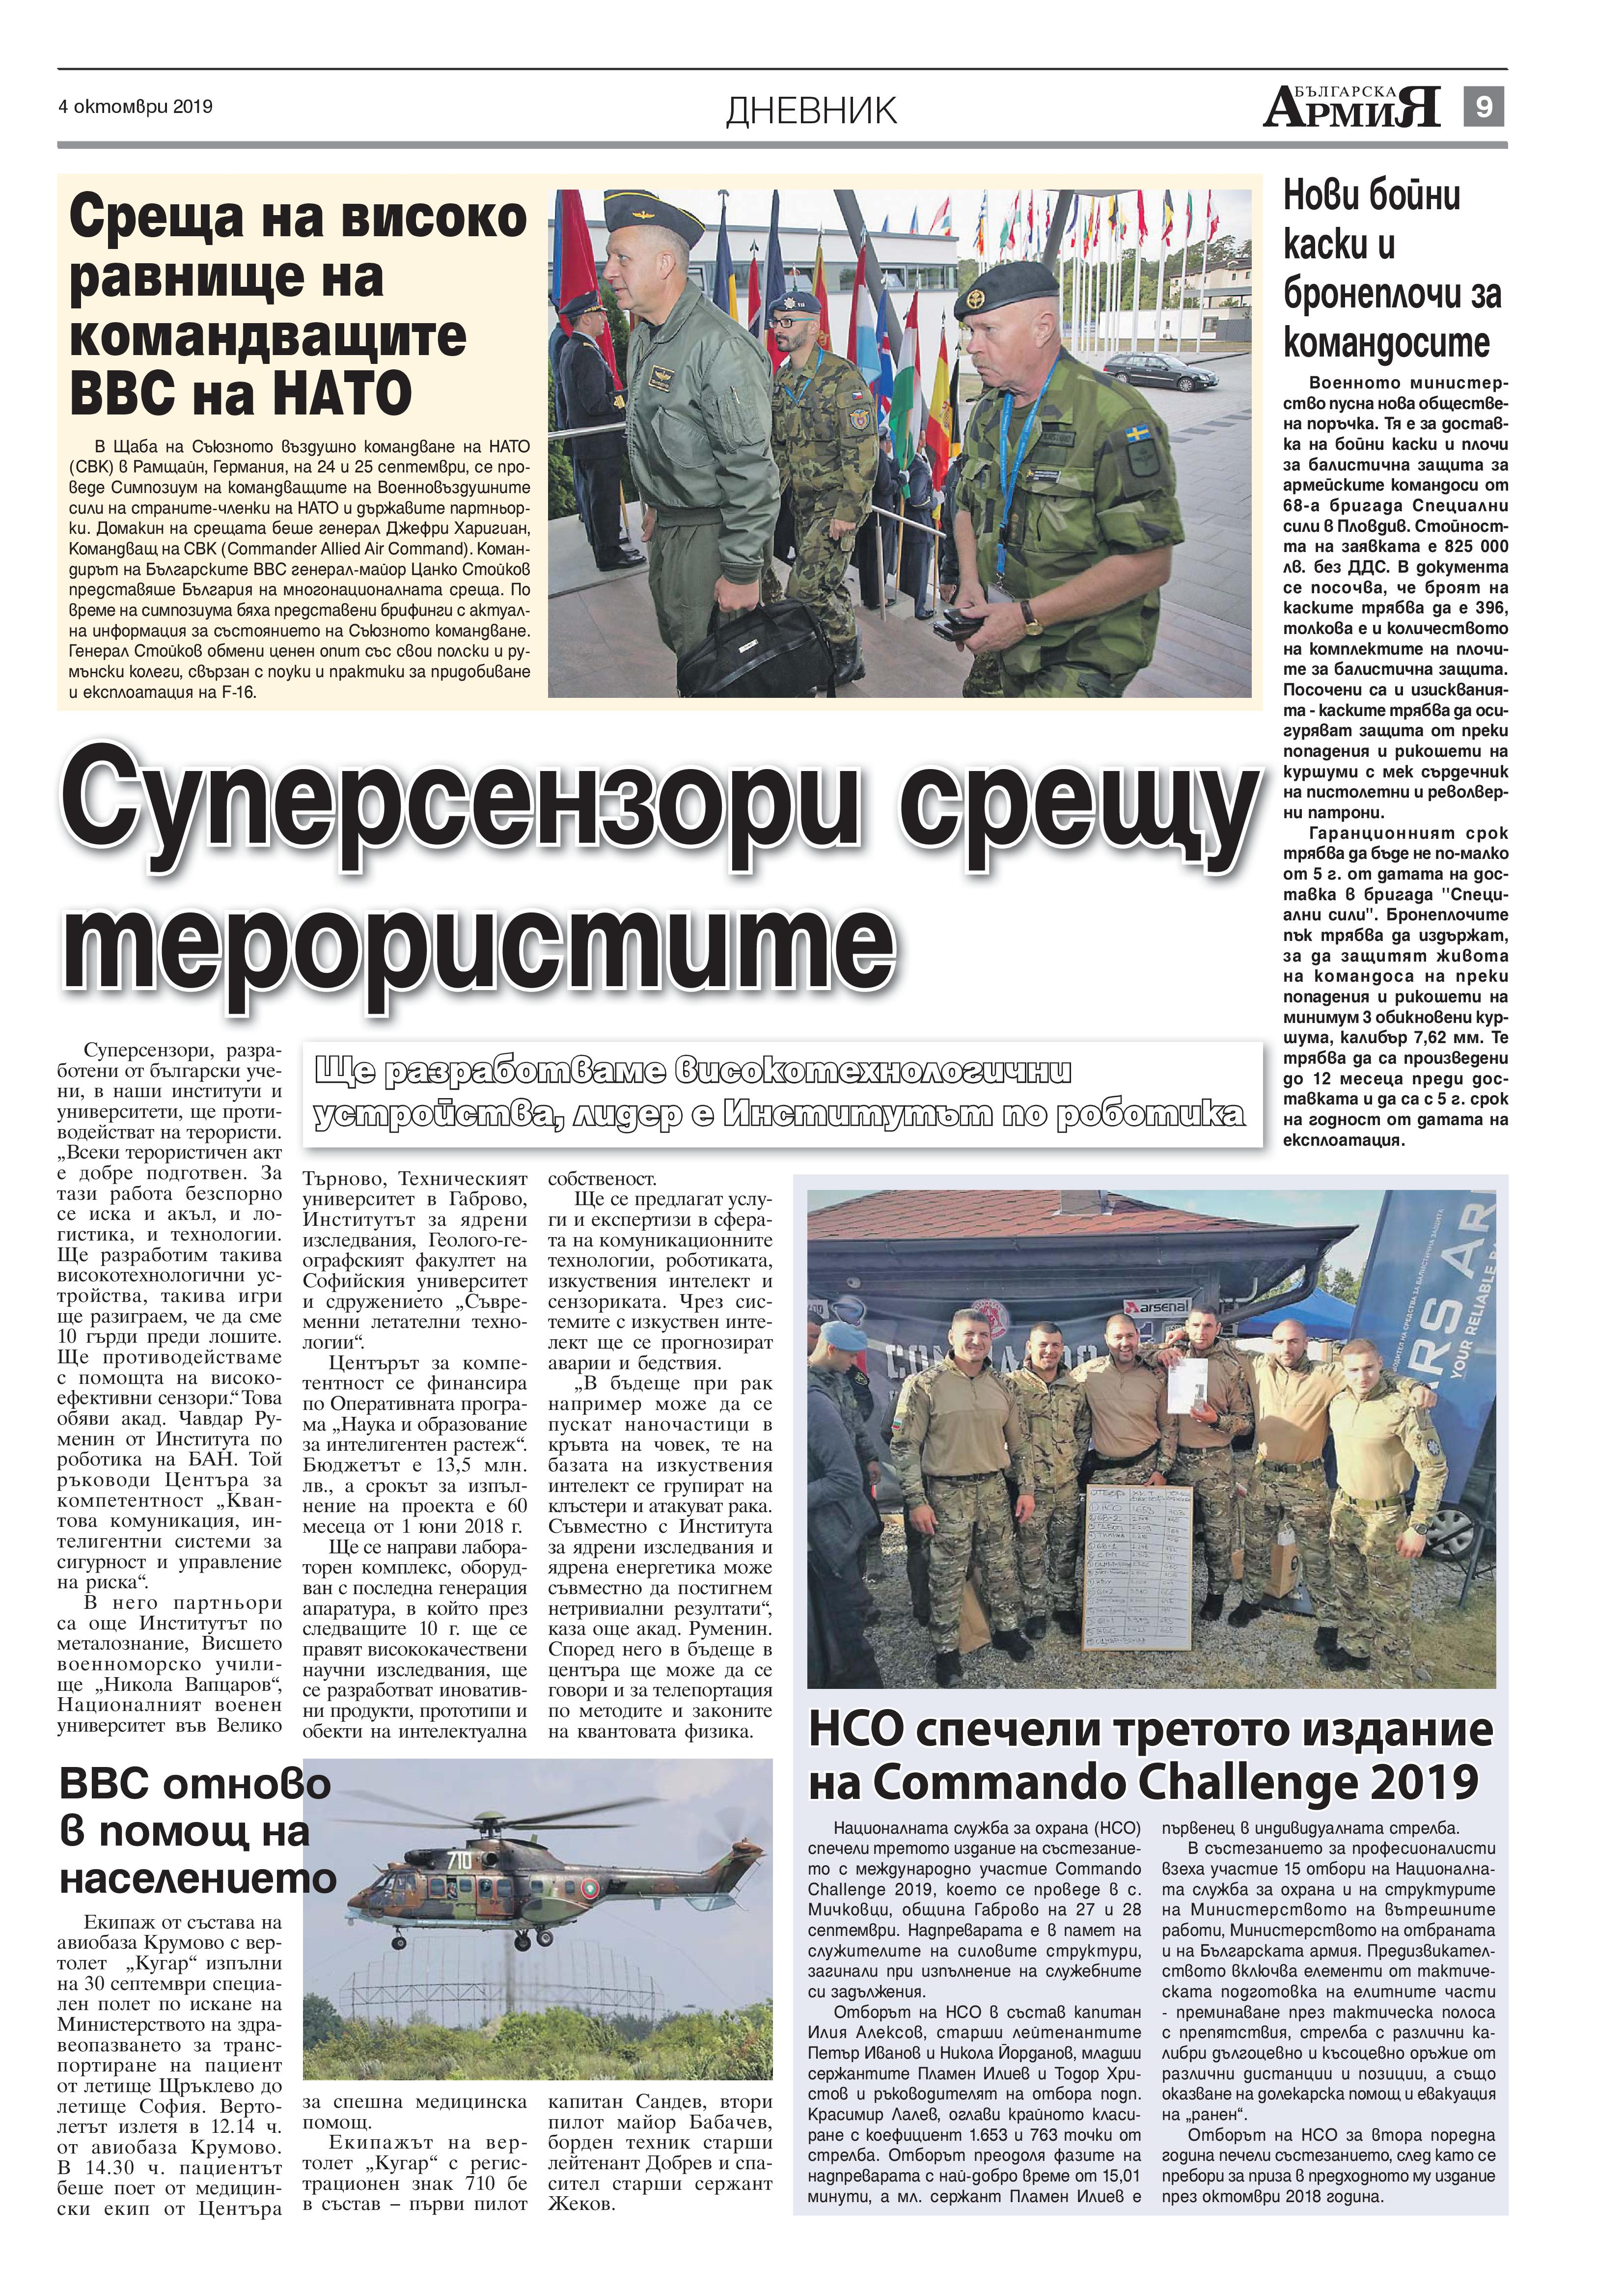 https://www.armymedia.bg/wp-content/uploads/2015/06/09-32.jpg